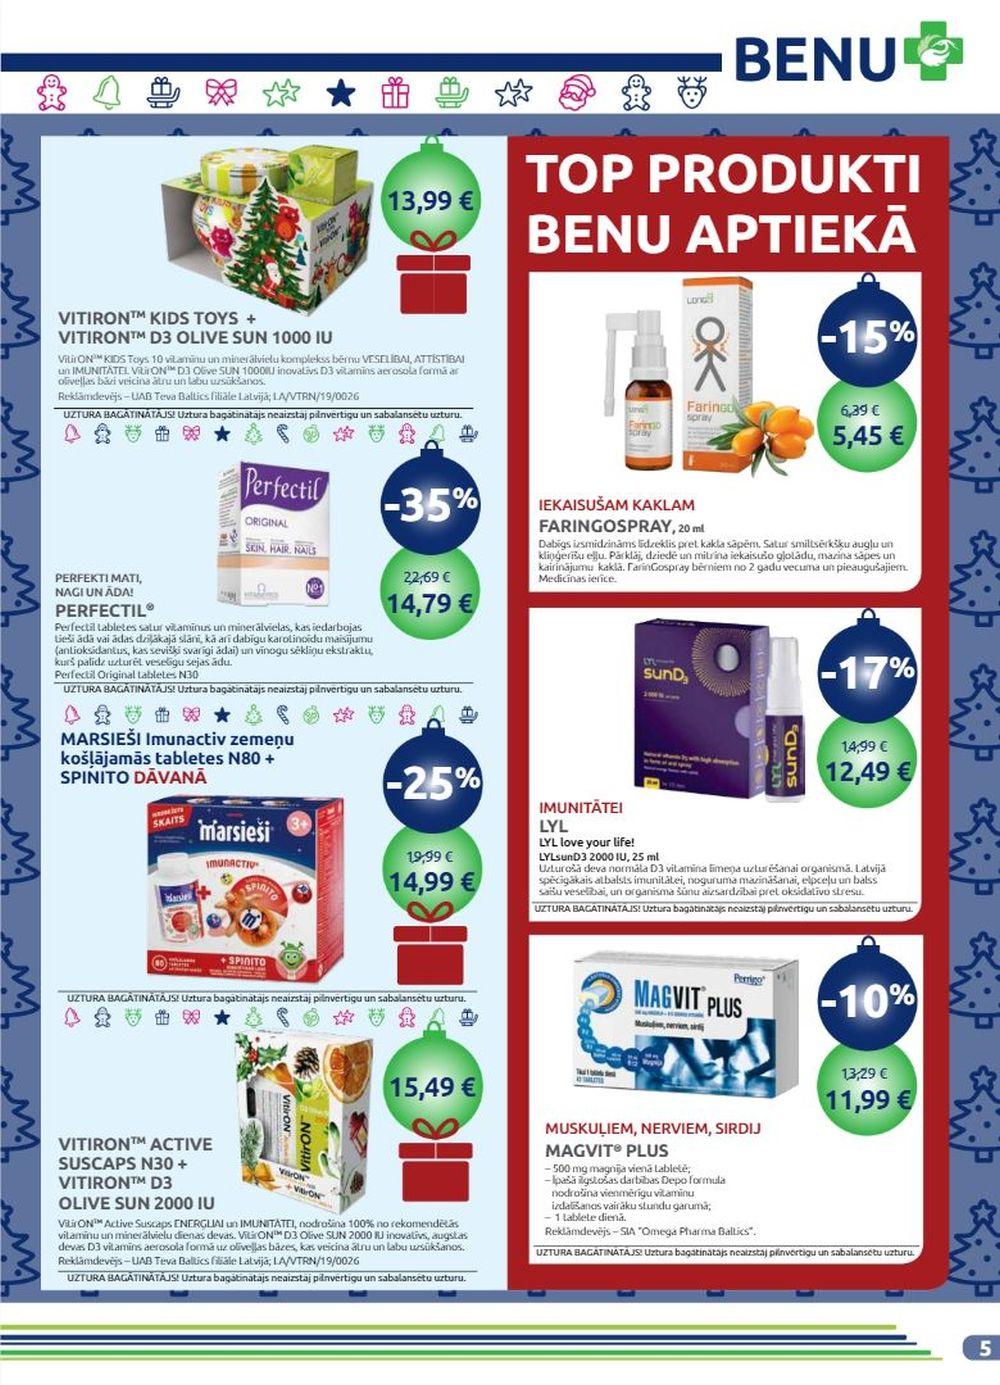 BENU akcijas buklets 01.12.2019 - 31.12.2019